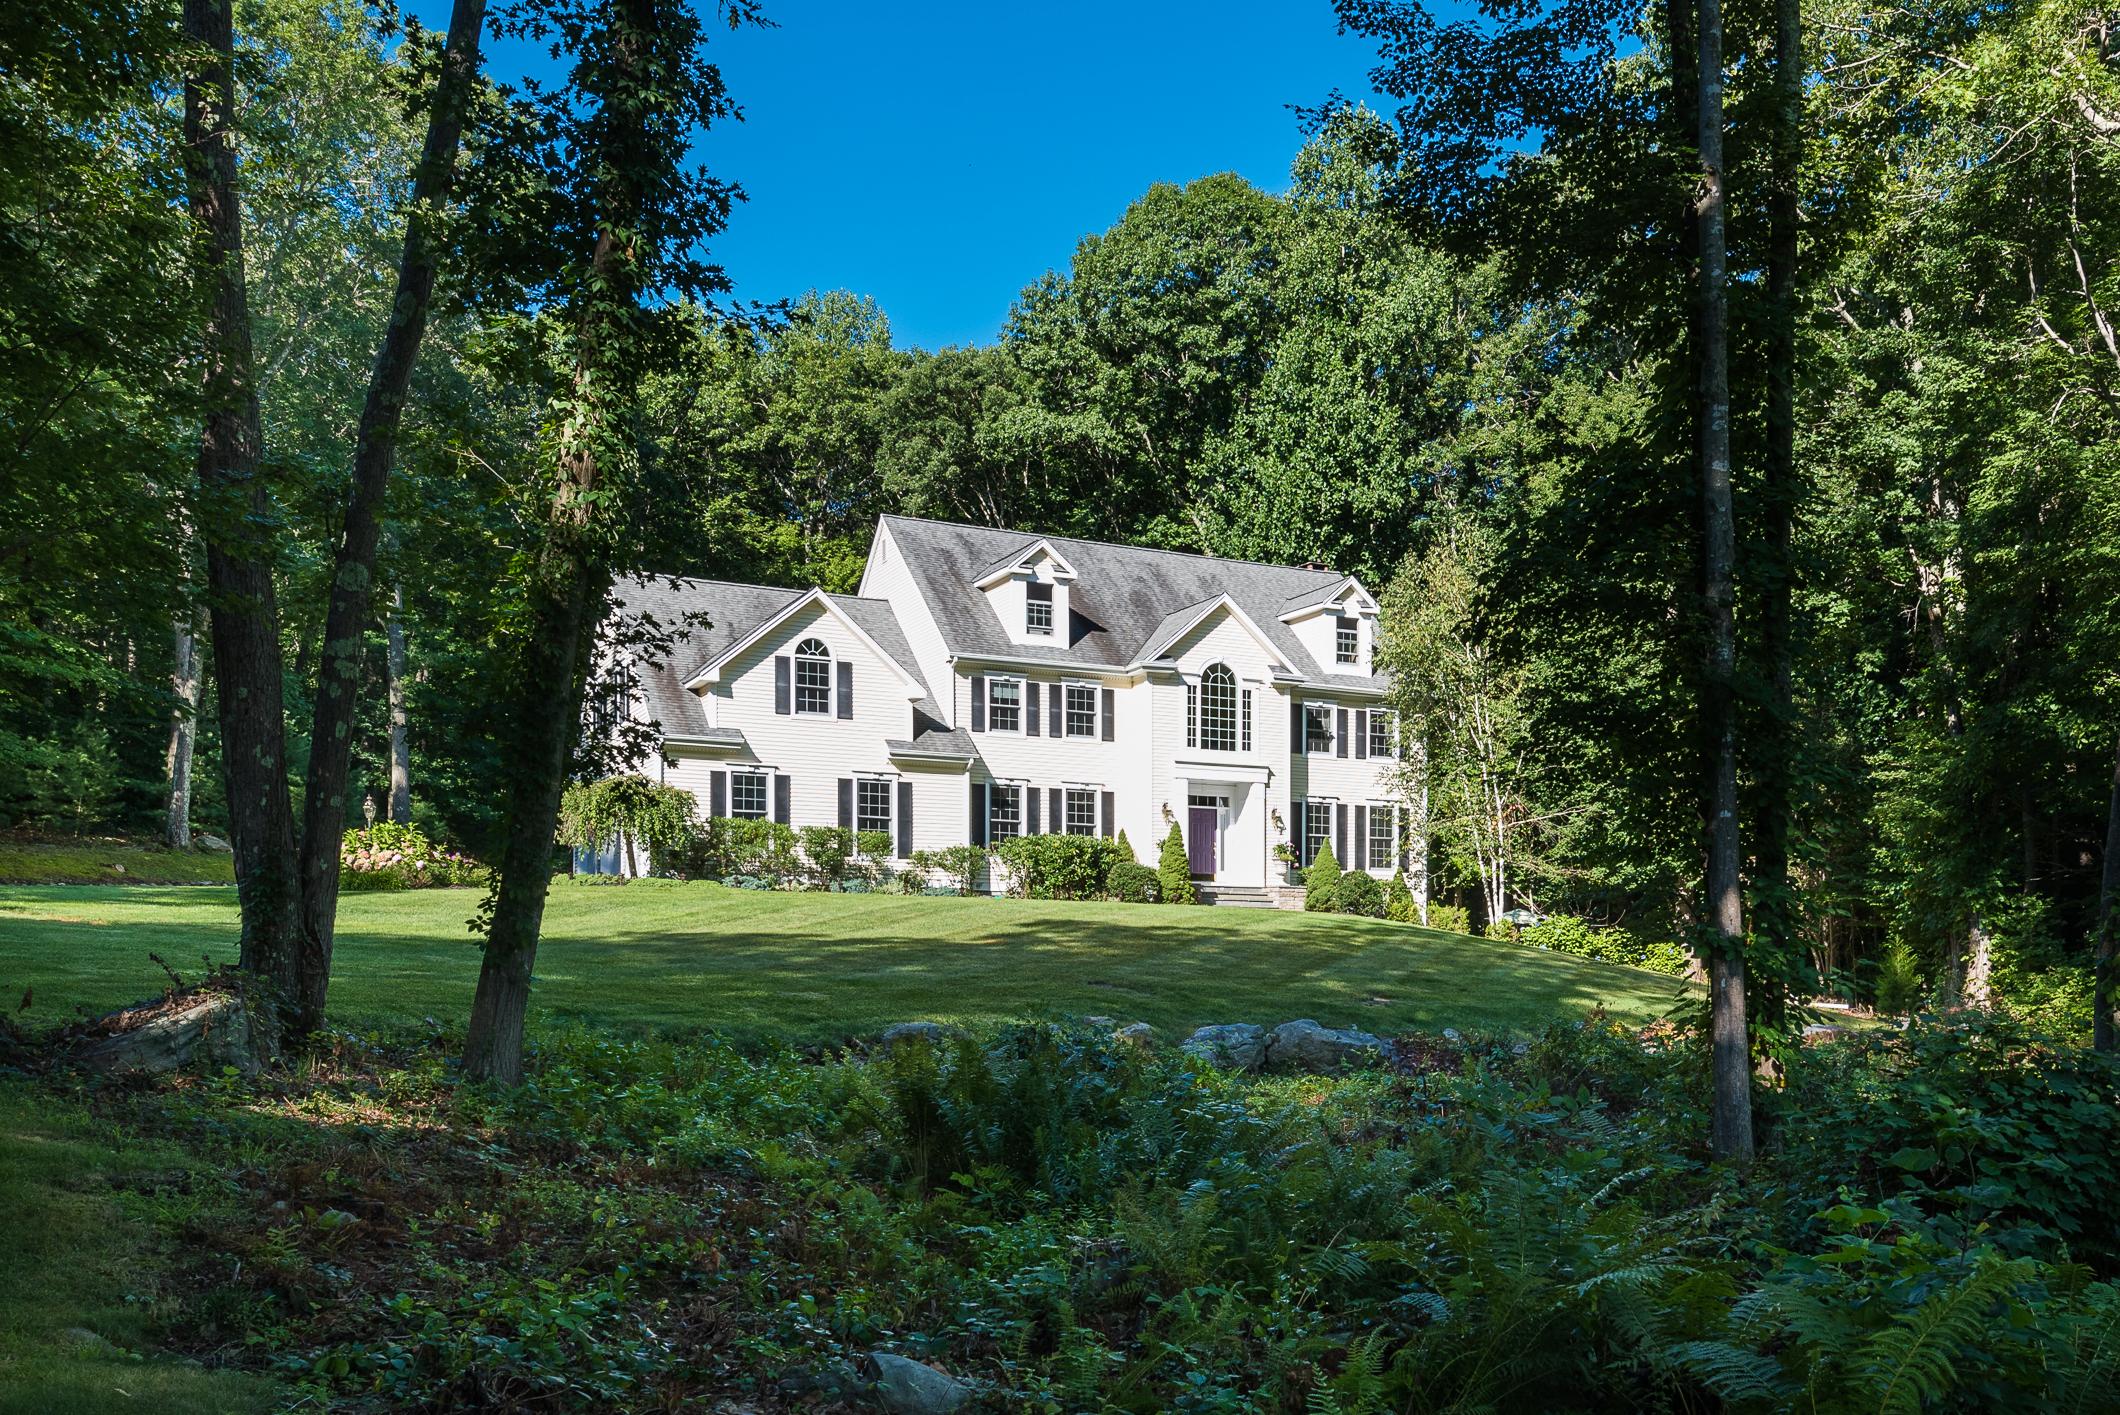 Casa Unifamiliar por un Venta en 58 High Hill Circle Madison, Connecticut 06443 Estados Unidos